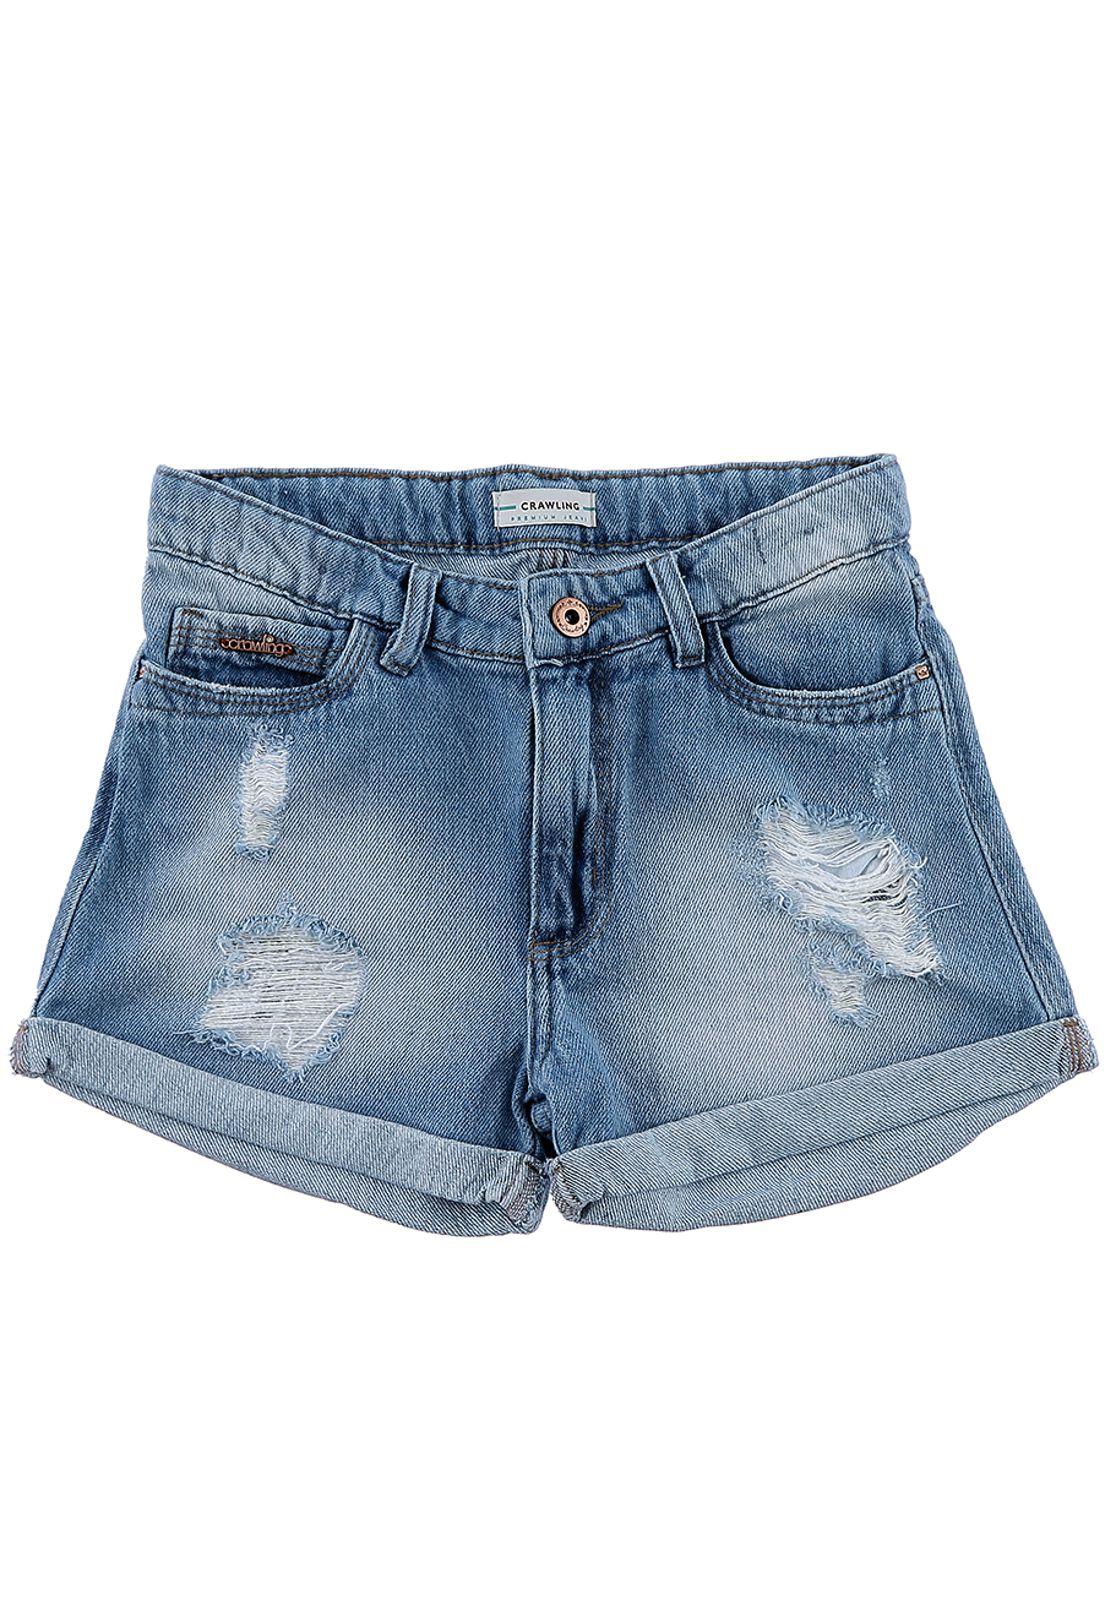 Short Feminino Comfort Destroyed Crawling Jeans